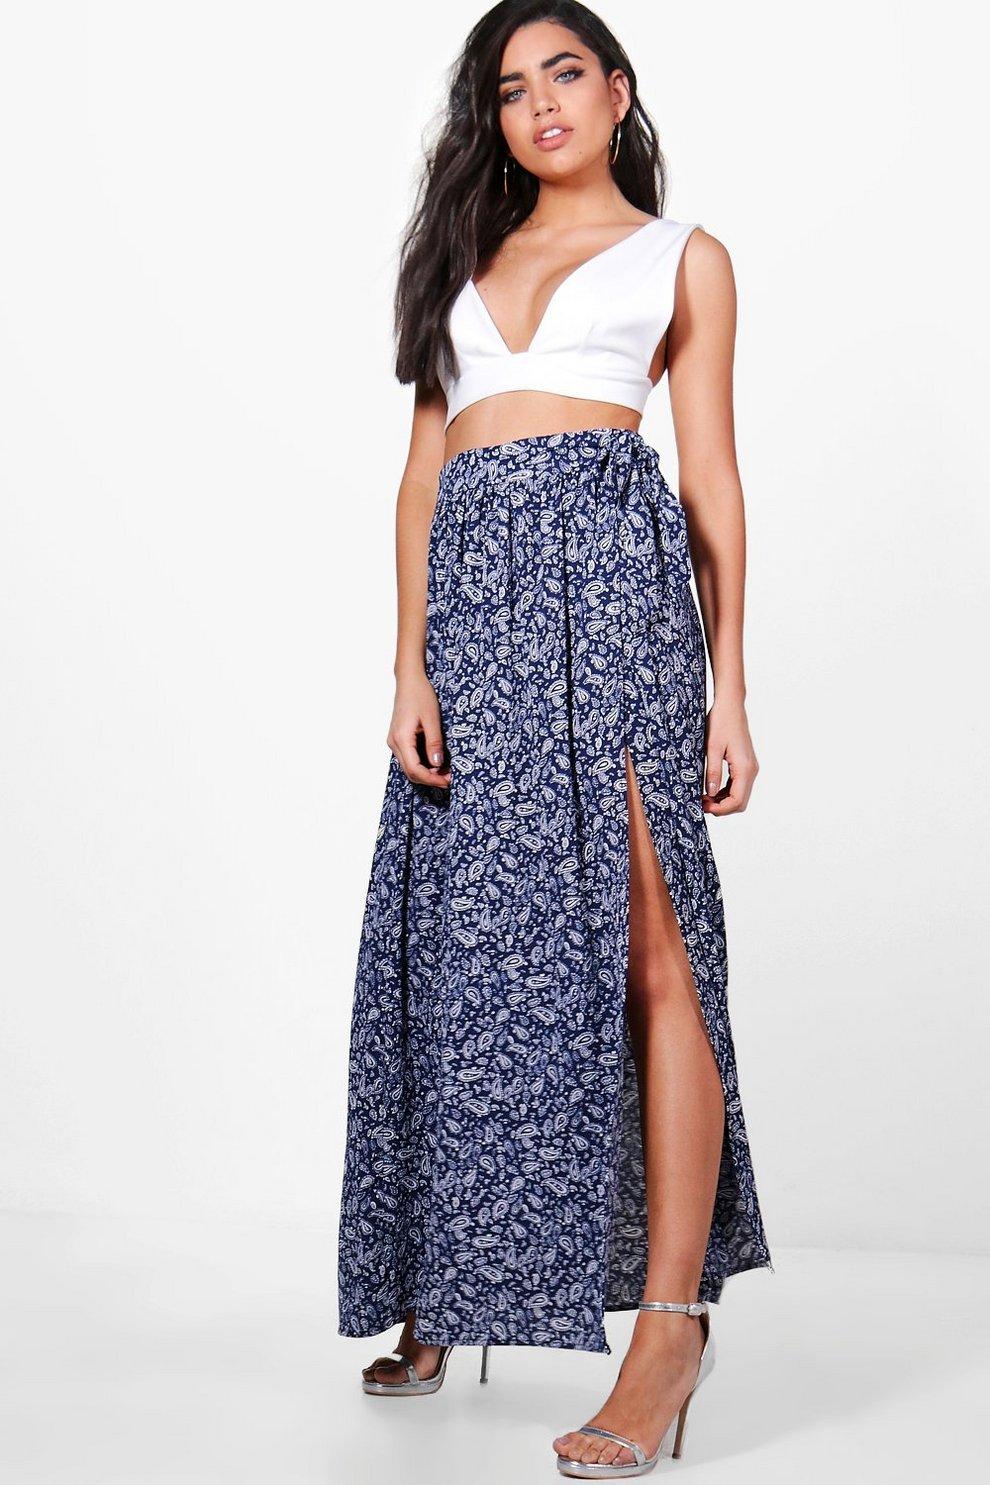 567d627d1e9a India Woven Paisley Print Wrap Maxi Skirt   Boohoo